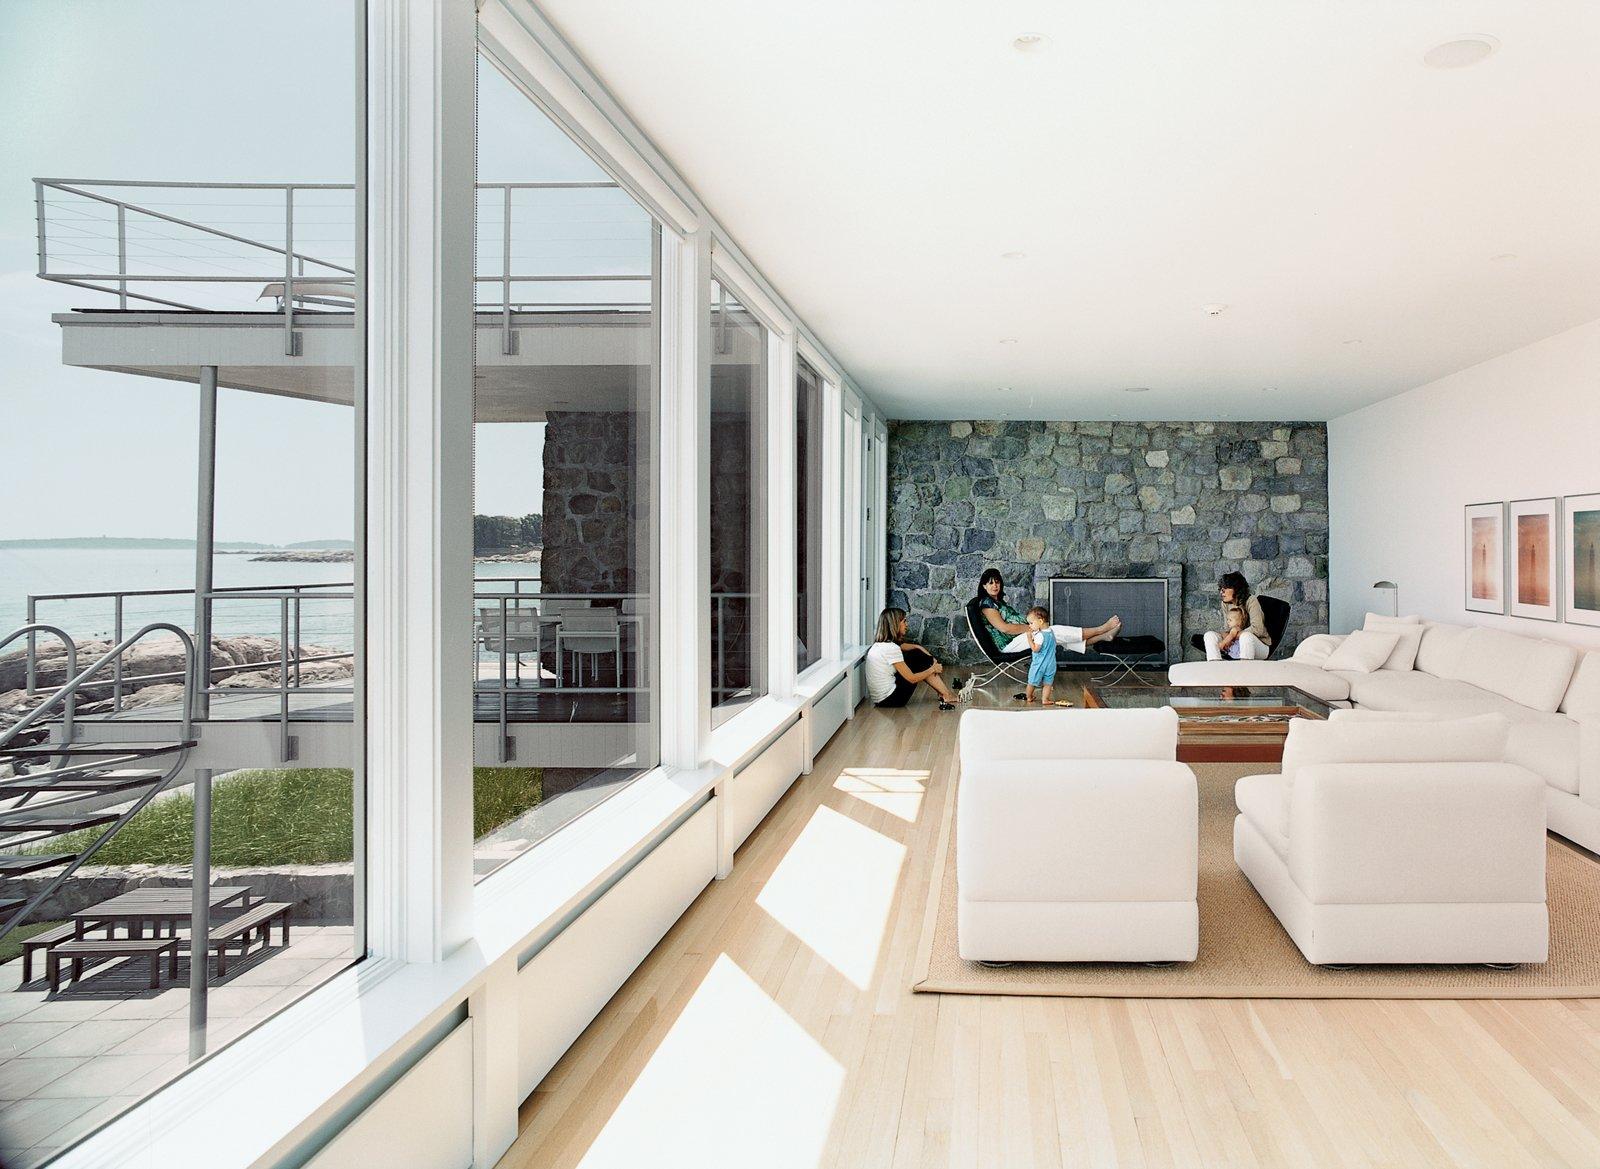 Bauhaus by the sea dwell for Decoracion de interiores rustico